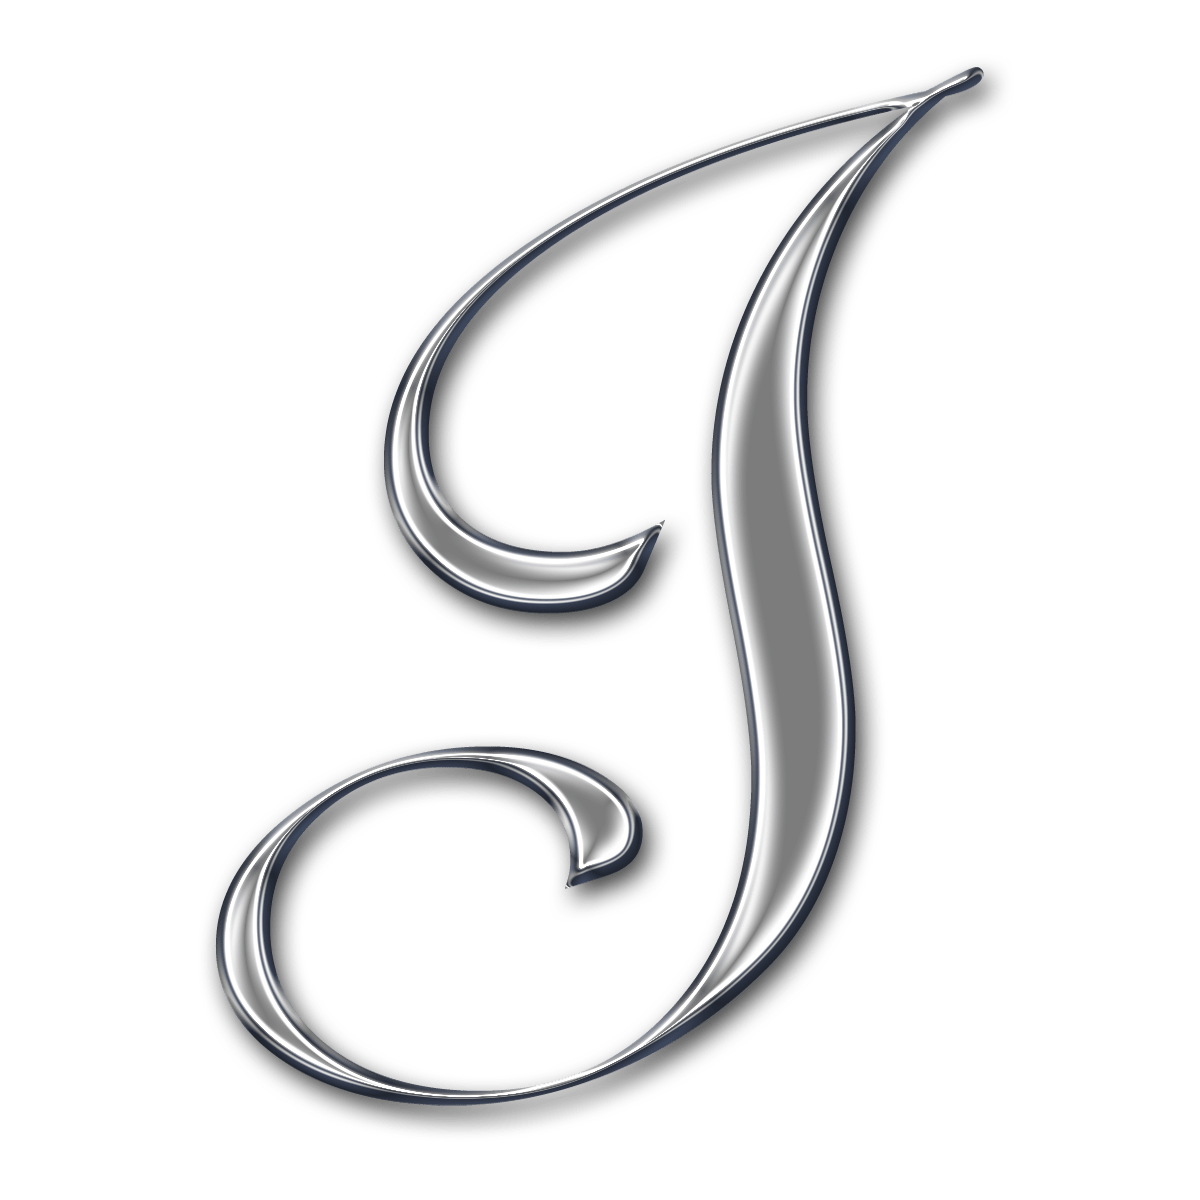 J GRANNY ENCHANTED'S BLOG FREE CHROME SWIRL DIGI